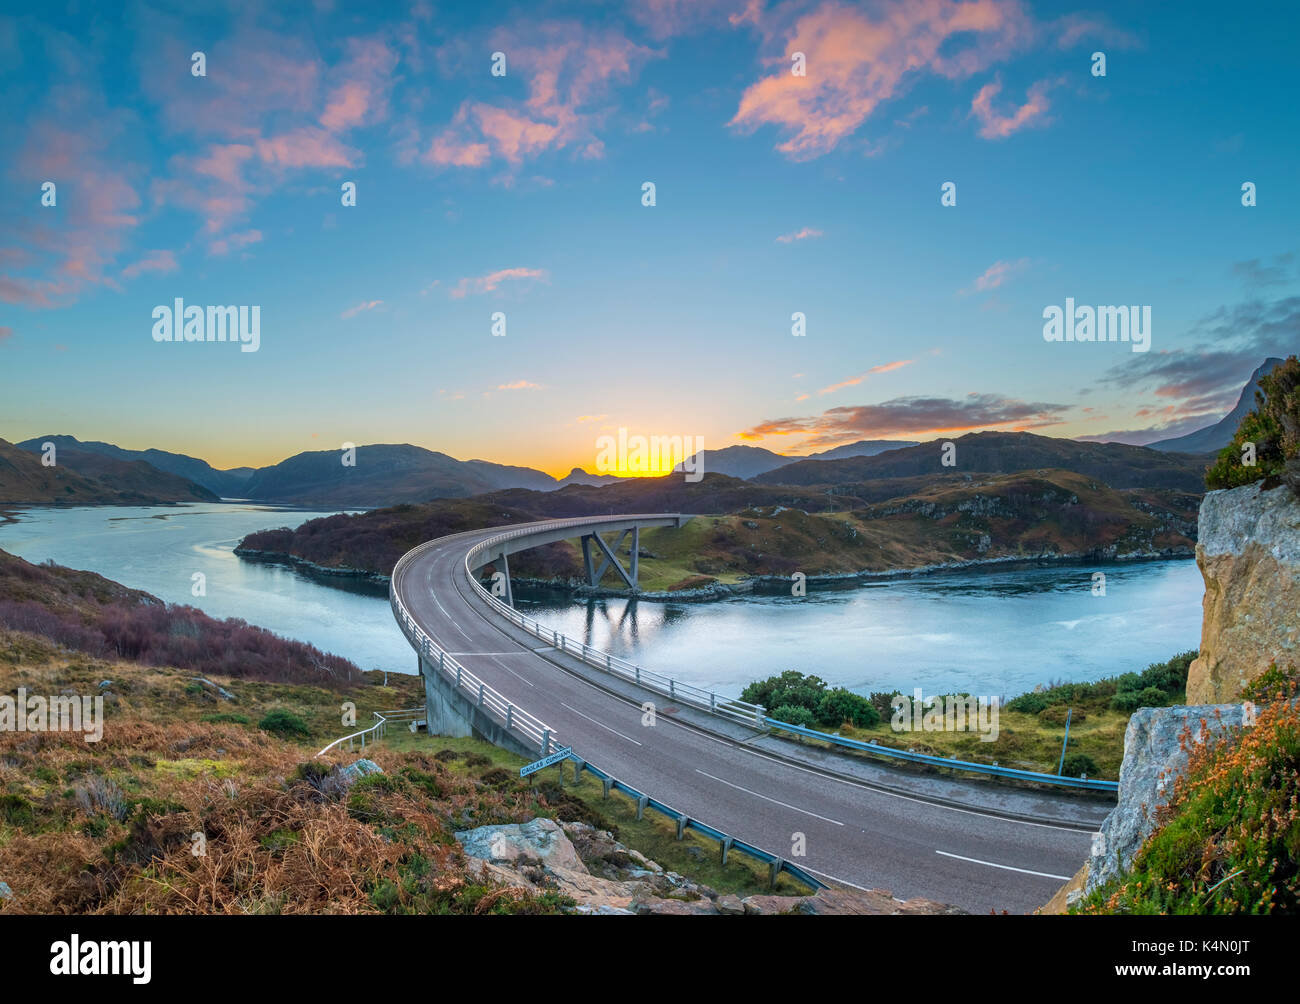 Loch a' Chairn Bhain, Kylesku, Kylesku Bridge, landmark on the North Coast 500 Tourist Route, Sutherland, Highlands, Scotland, United Kingdom, Europe - Stock Image